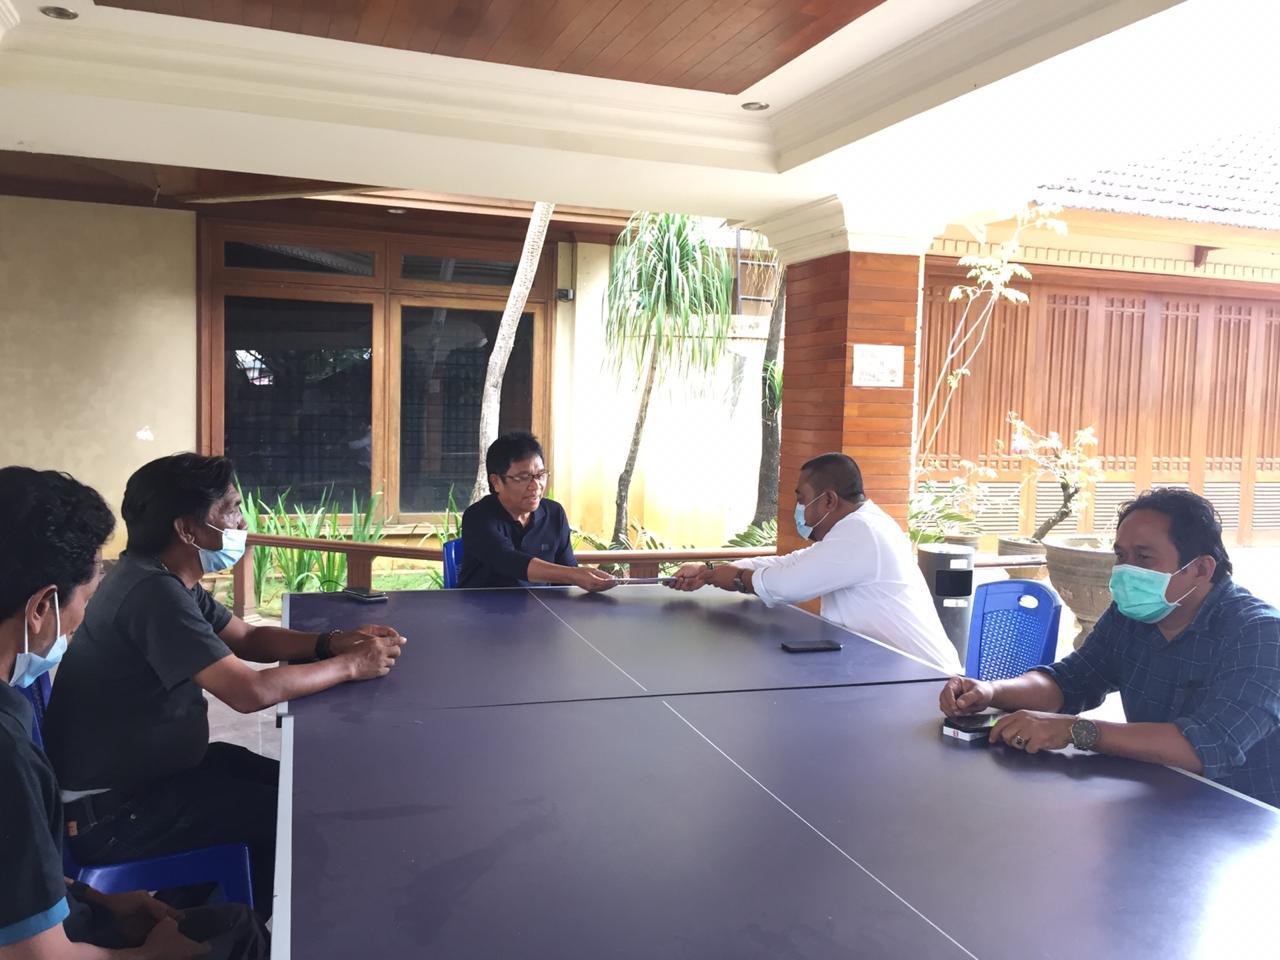 Ridwan Bae Siap Perjuangkan Aspirasi Masyarakat Bombana Terkait Jalan Lingkar Kabaena